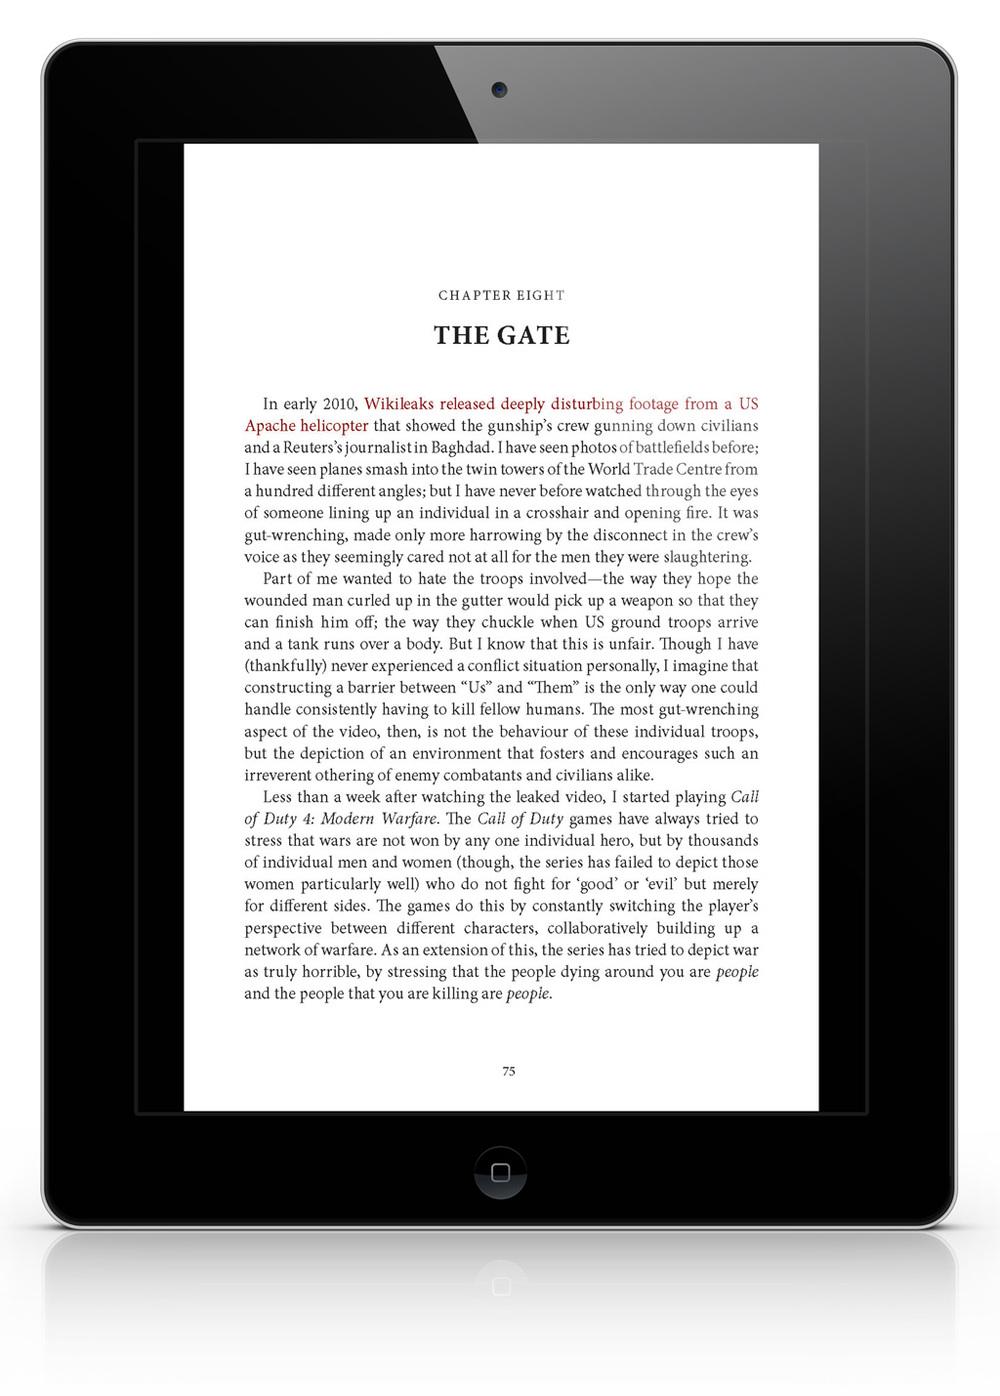 iPad-Retina-Display-Mockup2.jpg